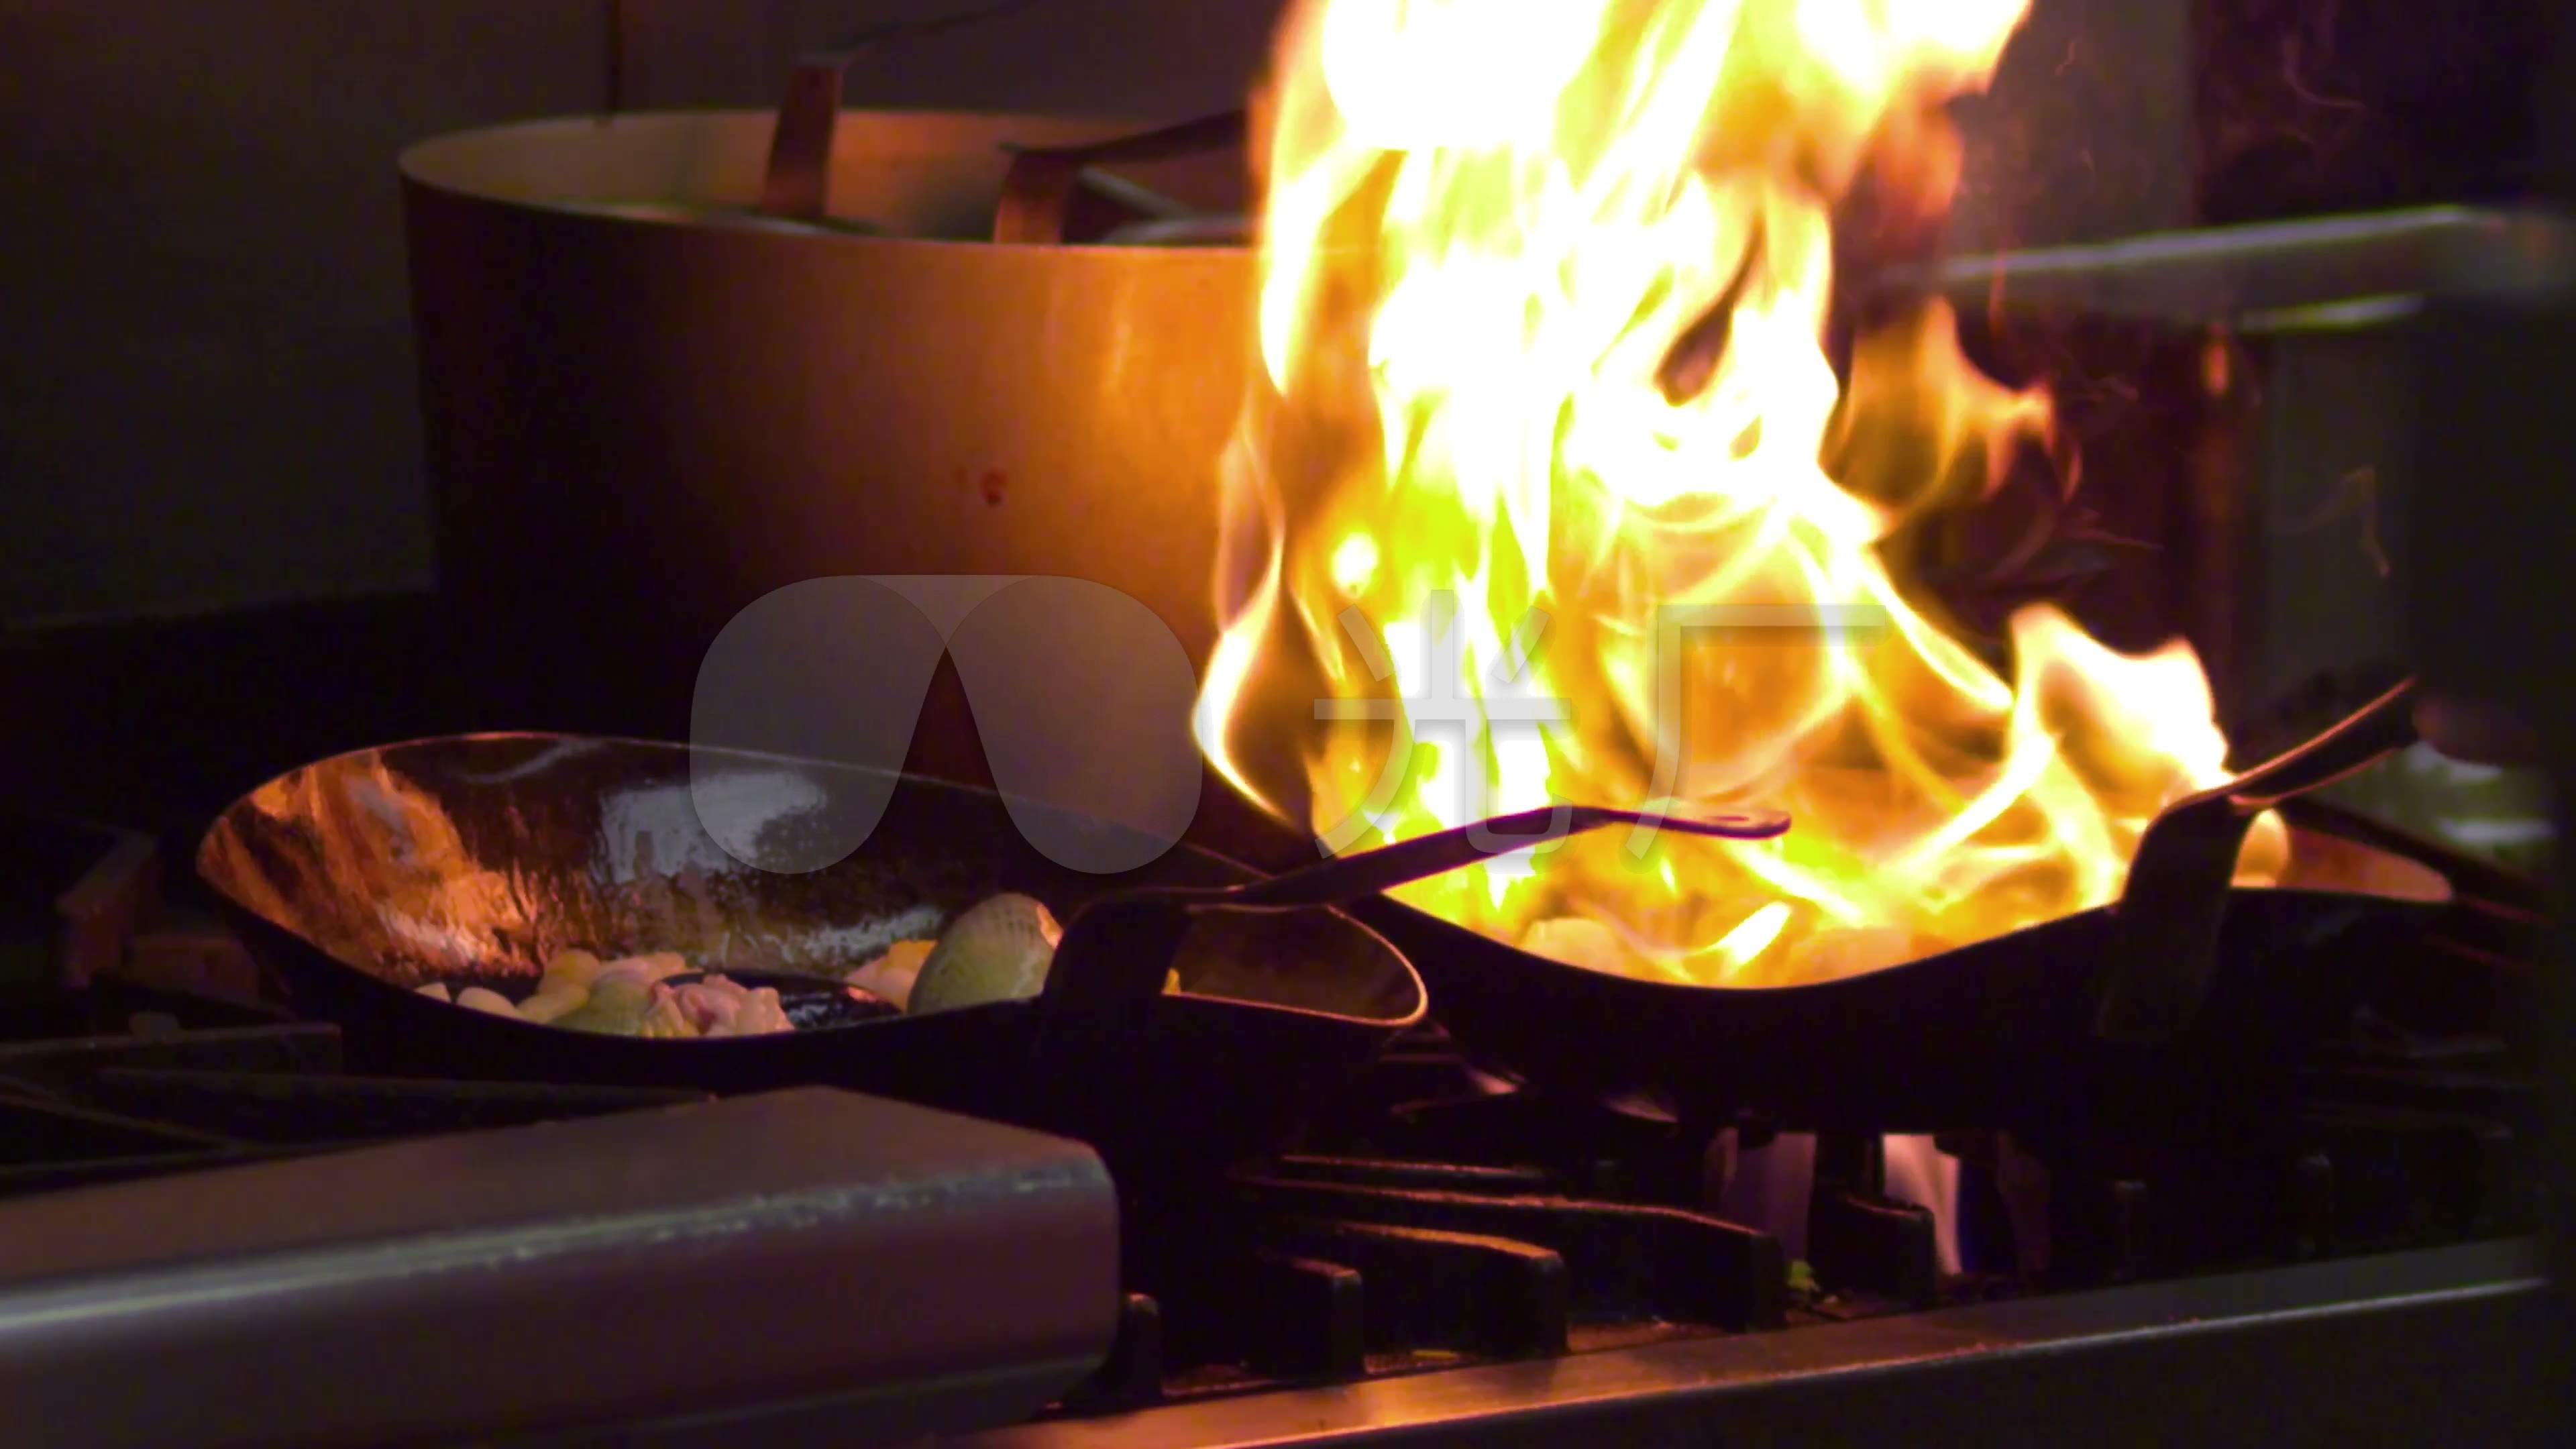 4k厨房厨师炒菜炒勺火焰火苗_3840x2160_高清视频素材图片